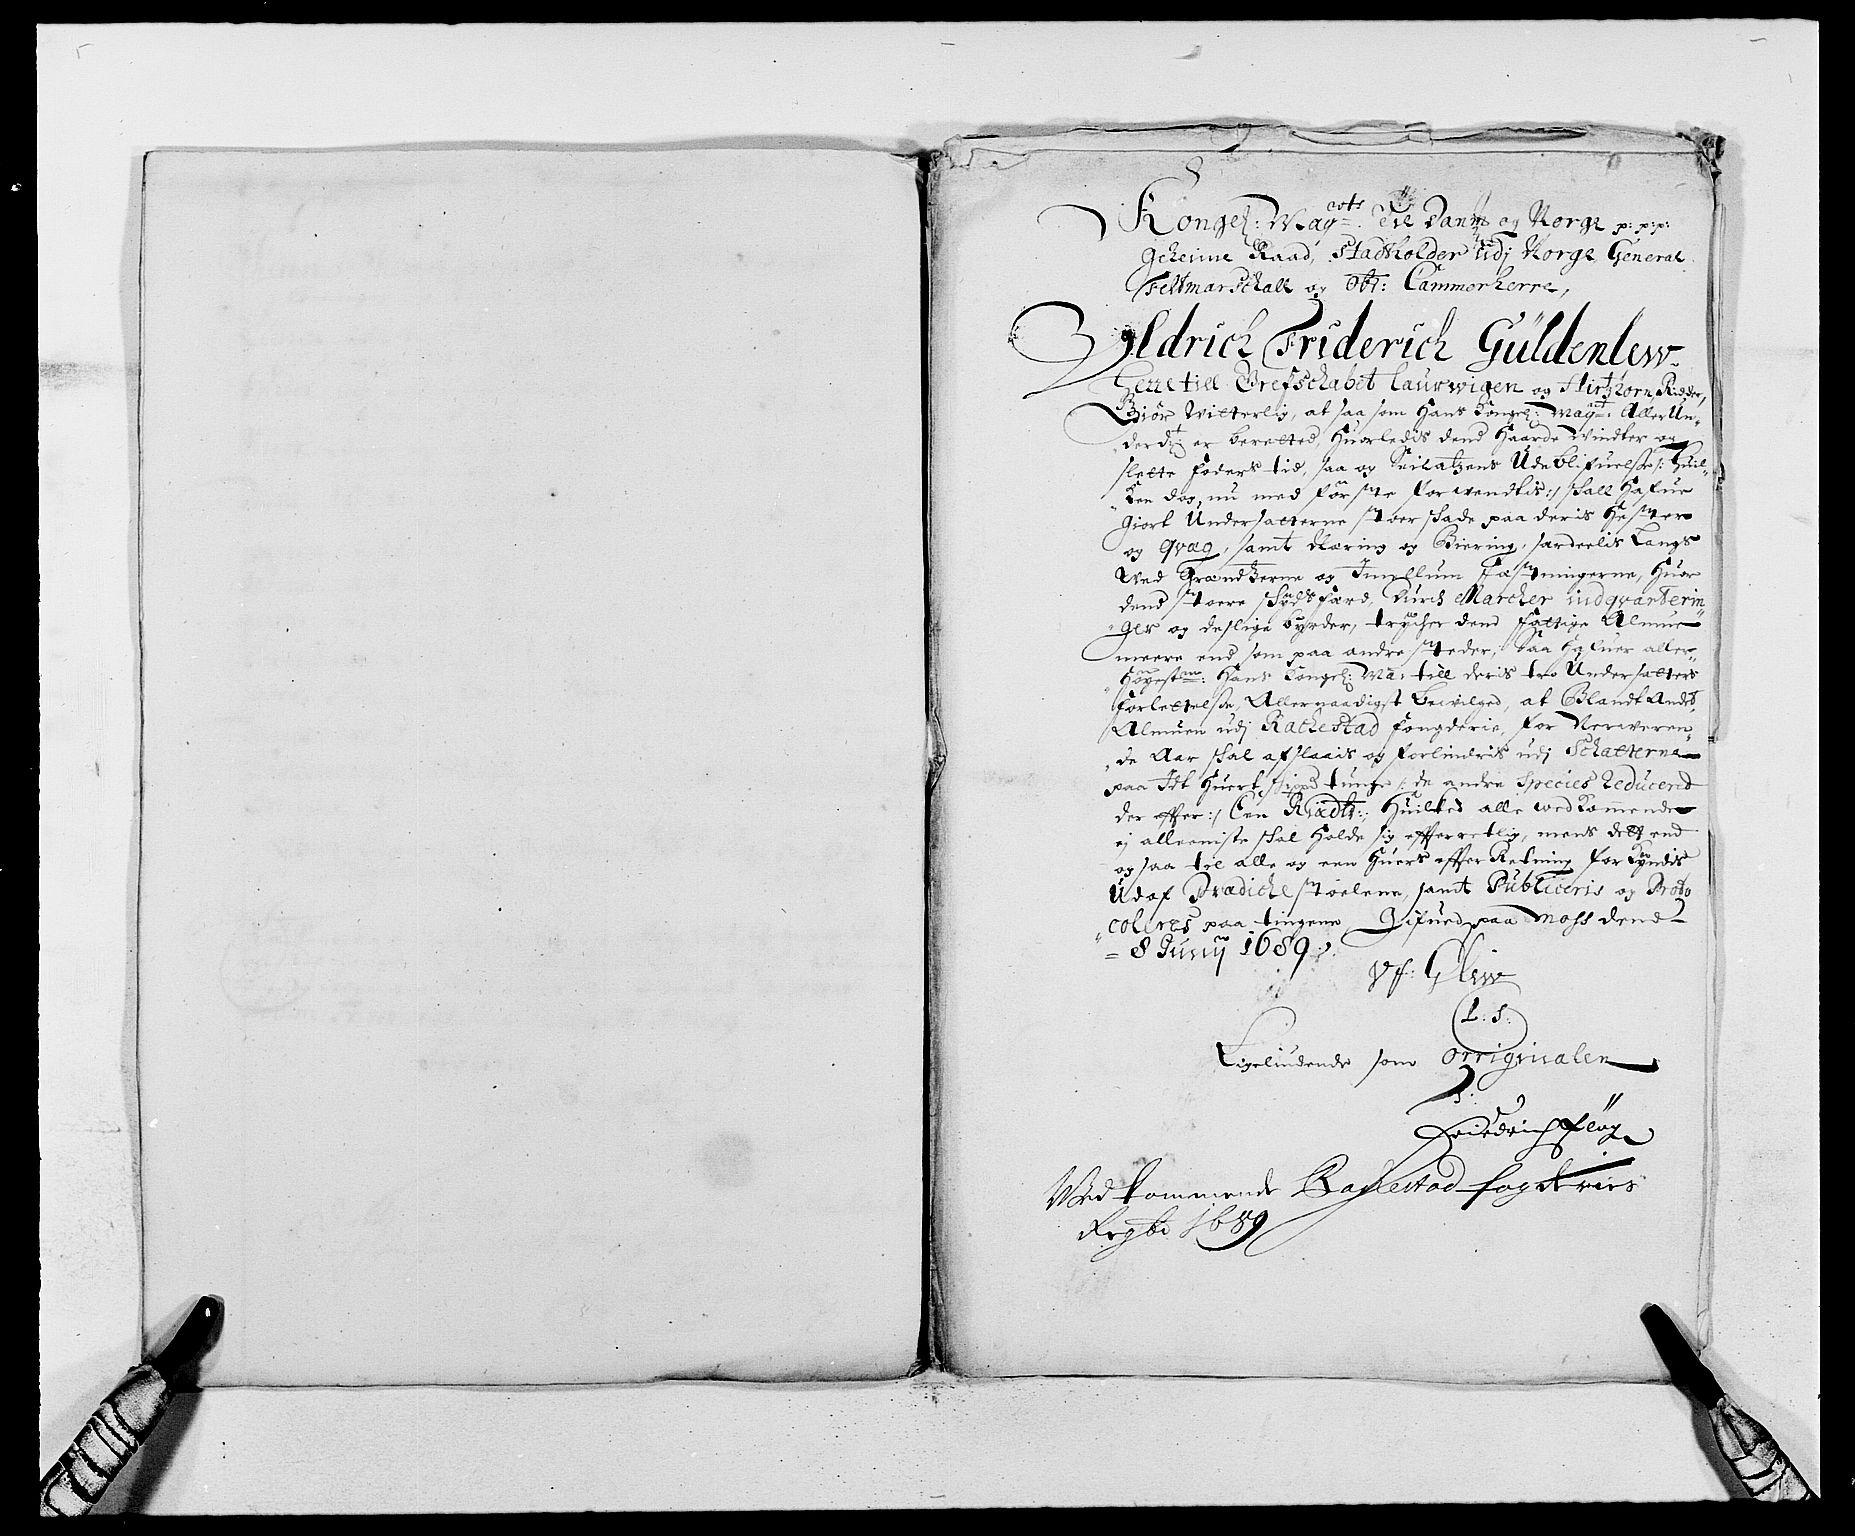 RA, Rentekammeret inntil 1814, Reviderte regnskaper, Fogderegnskap, R05/L0277: Fogderegnskap Rakkestad, 1689-1690, s. 348